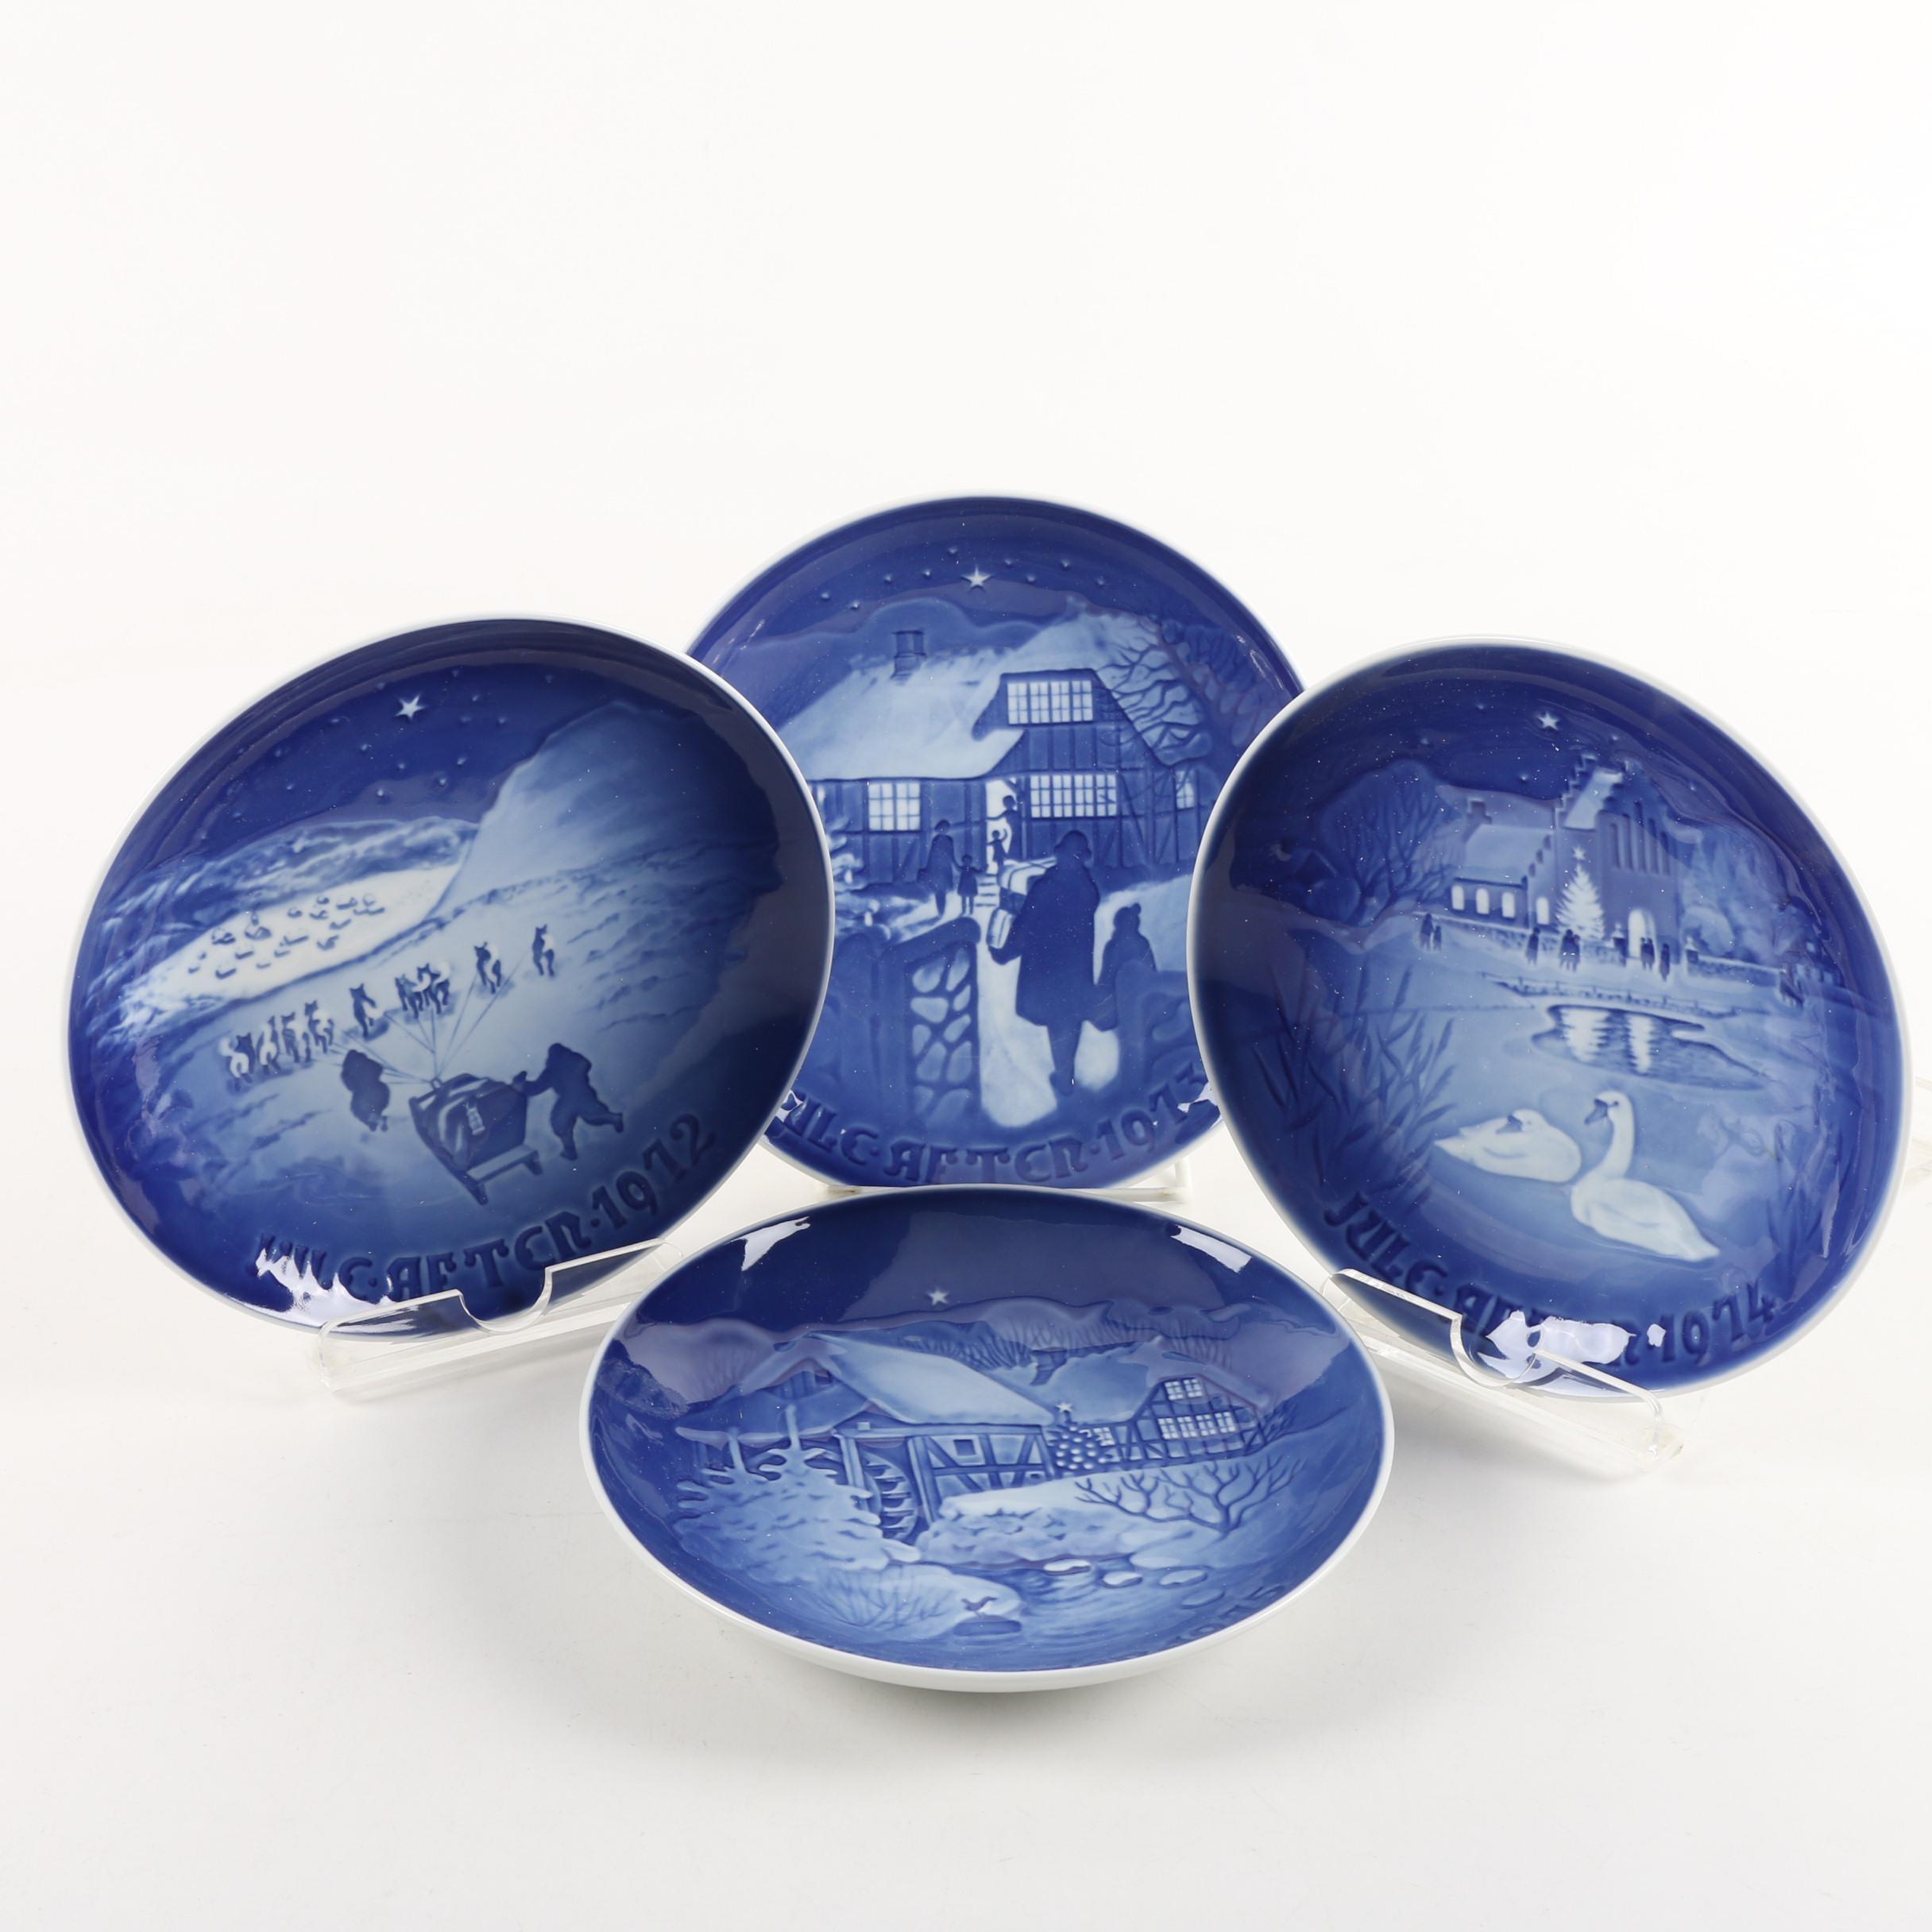 Bing & Grondahl Porcelain Christmas Plates 1972 to 1975